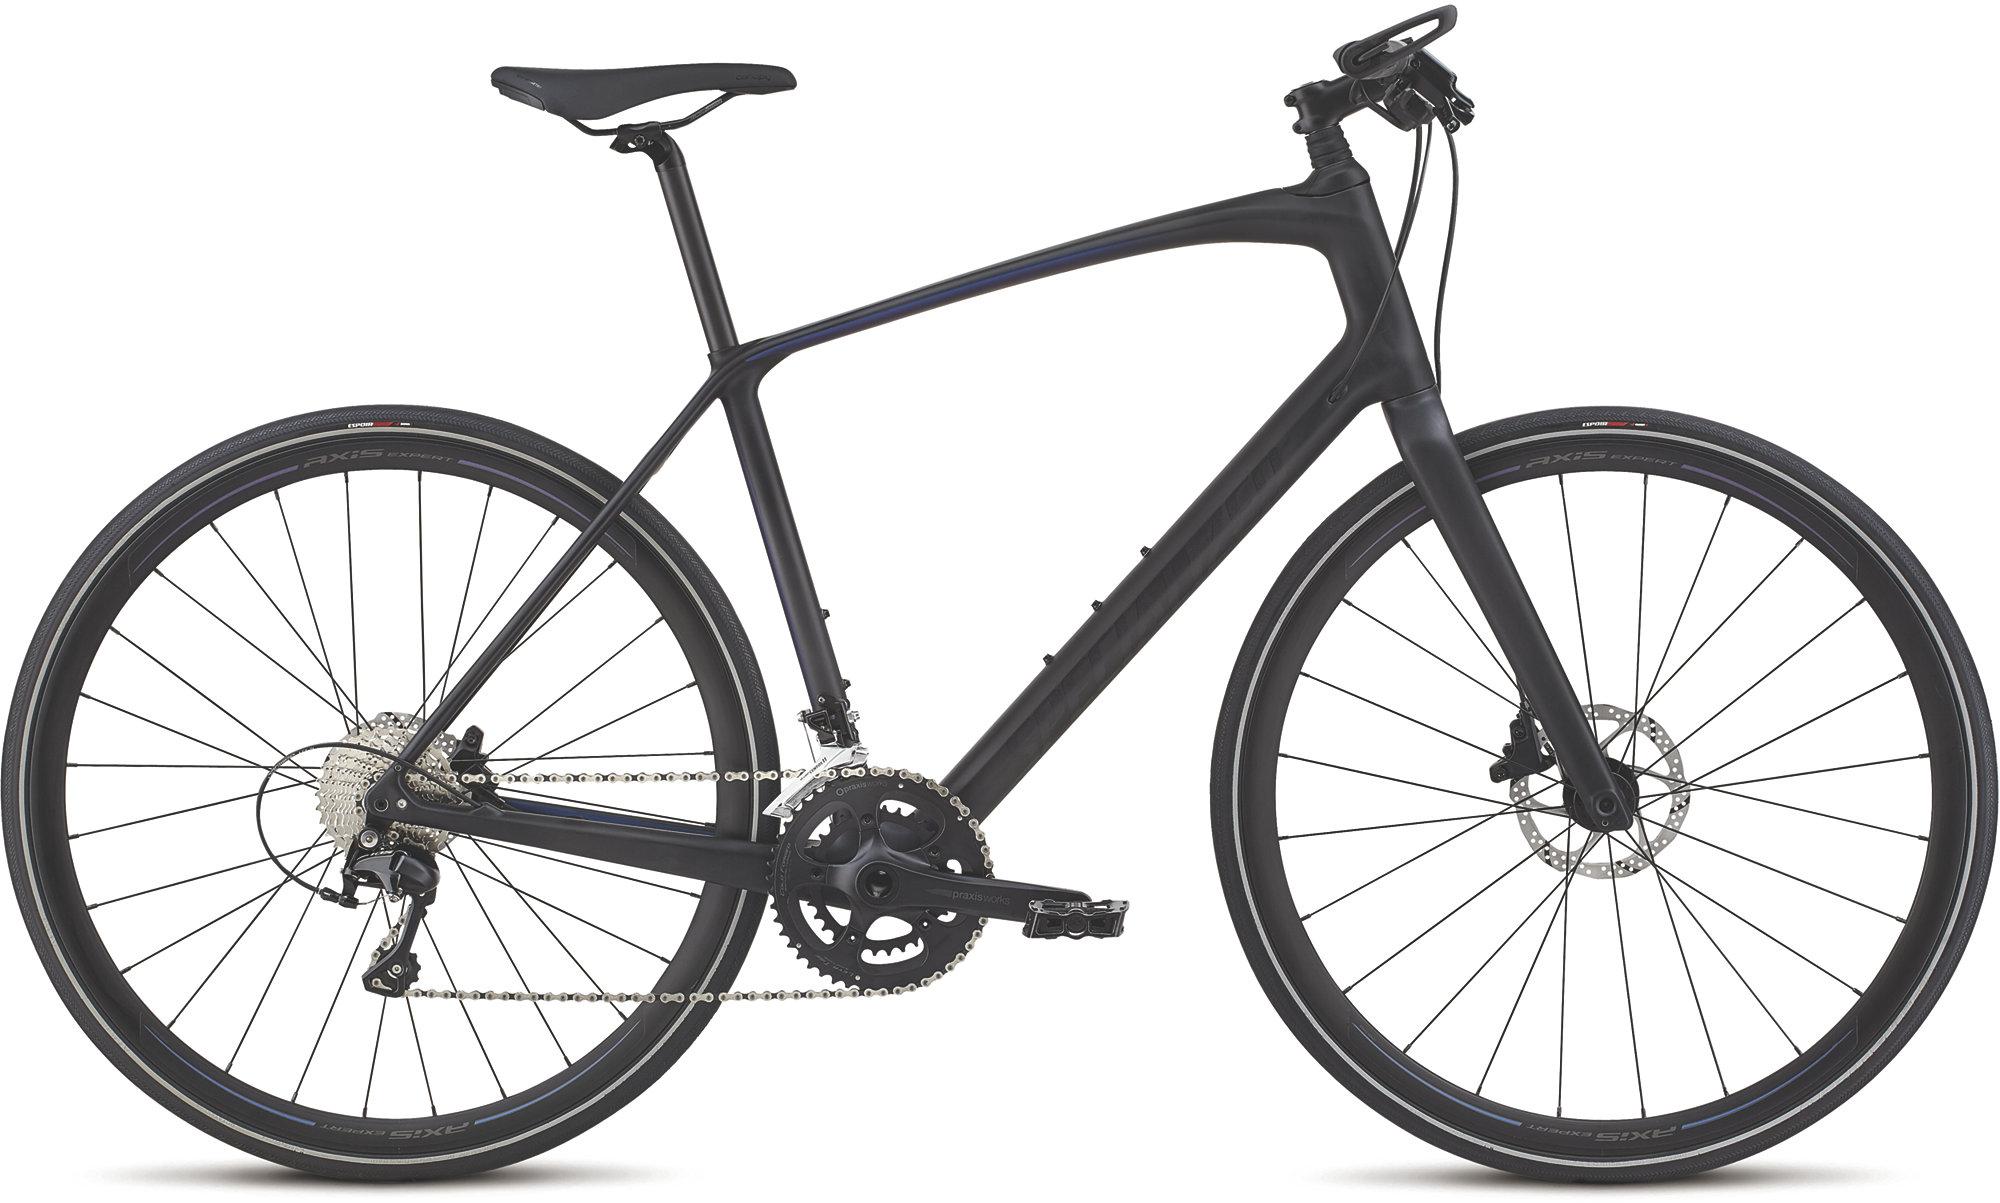 Specialized Sirrus Expert Carbon Hybrid Bike 2020 Graphite